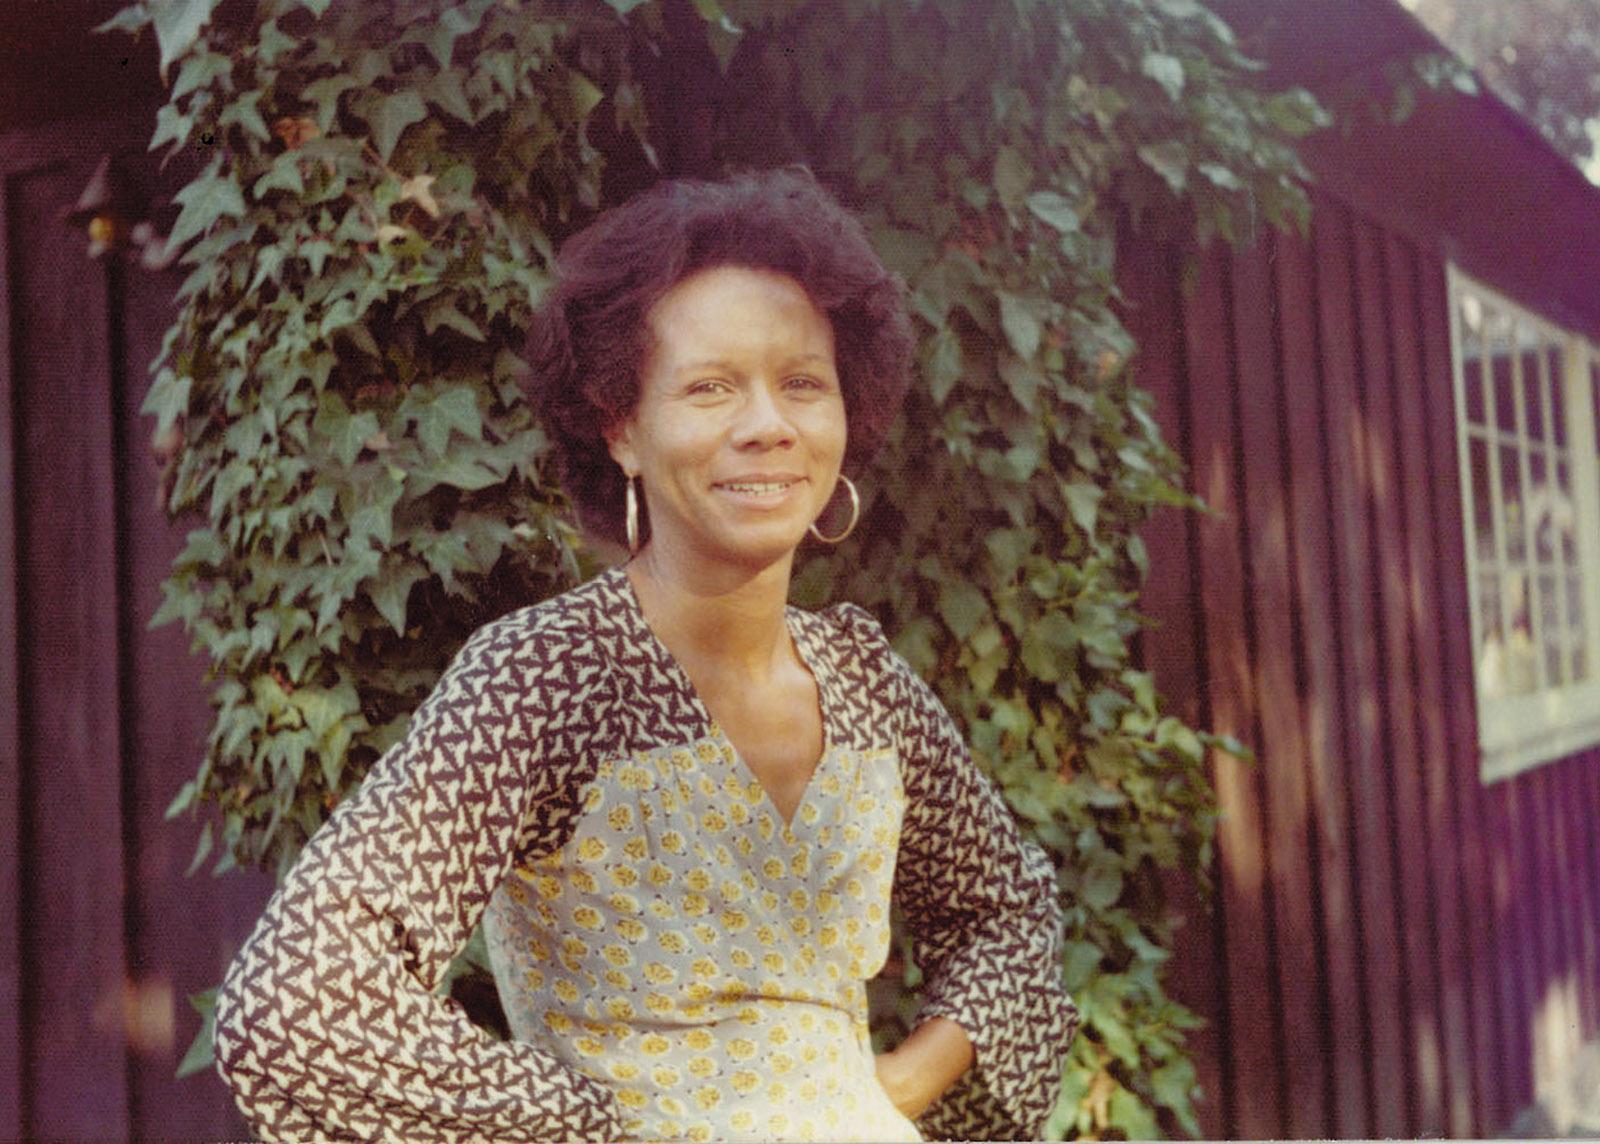 Kathleen Collins, upstate New York, circa 1983